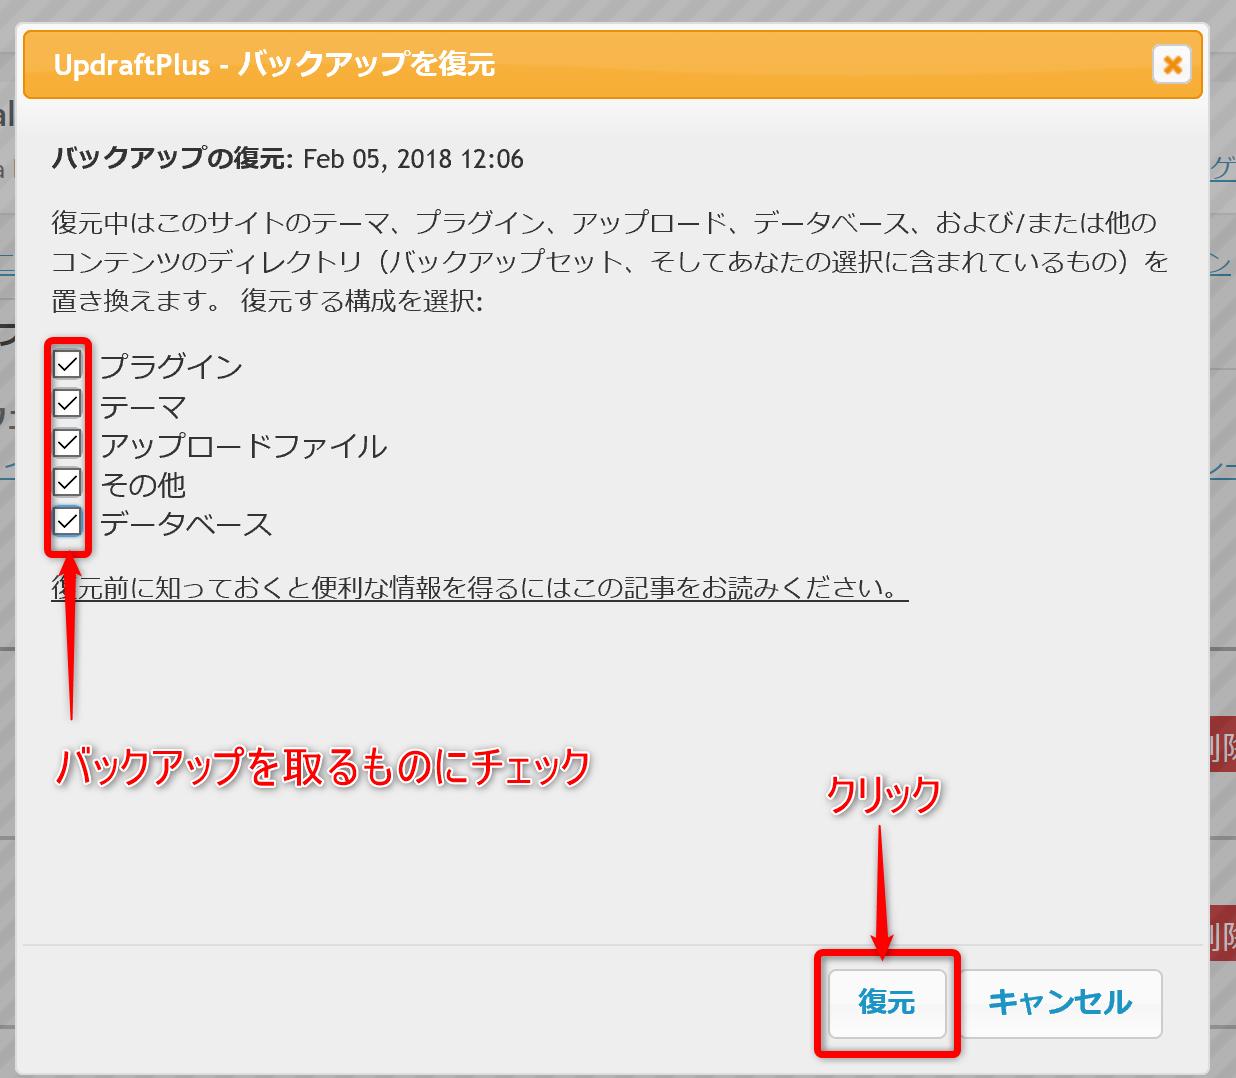 WordPressブログのバックアップ方法【プラグイン:UpdraftPlus】 | 僕 ...